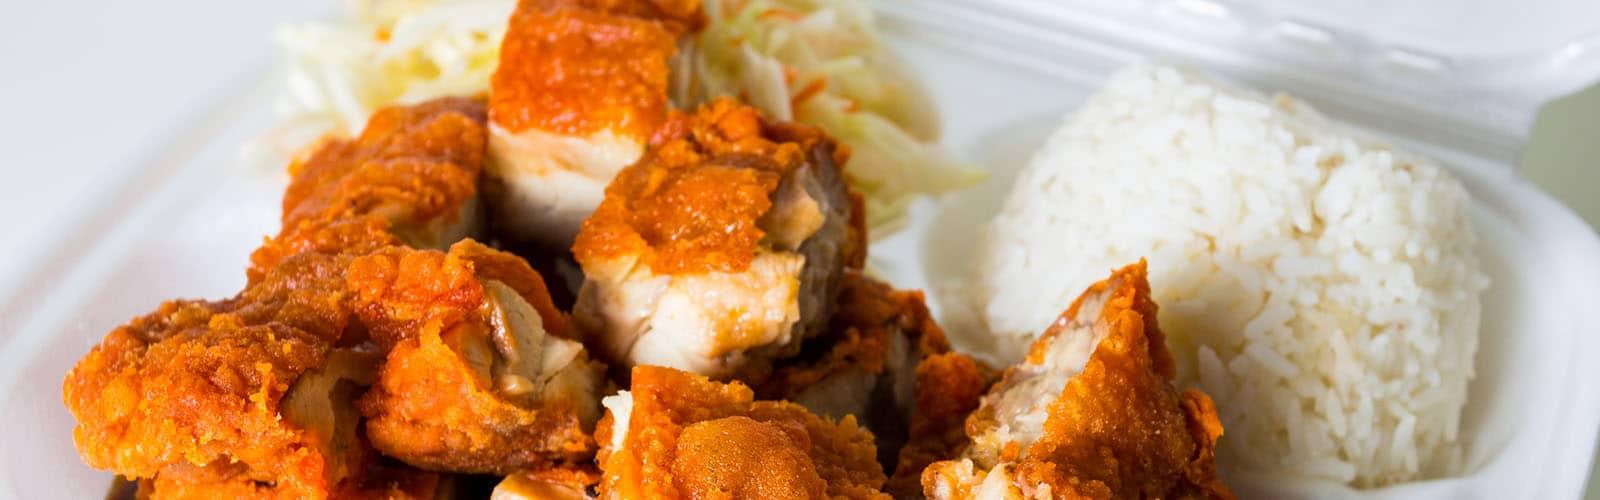 fastfood-disposables-wegwerp-bakjes-ps-thermo-borden-bestek-tray-groothandel